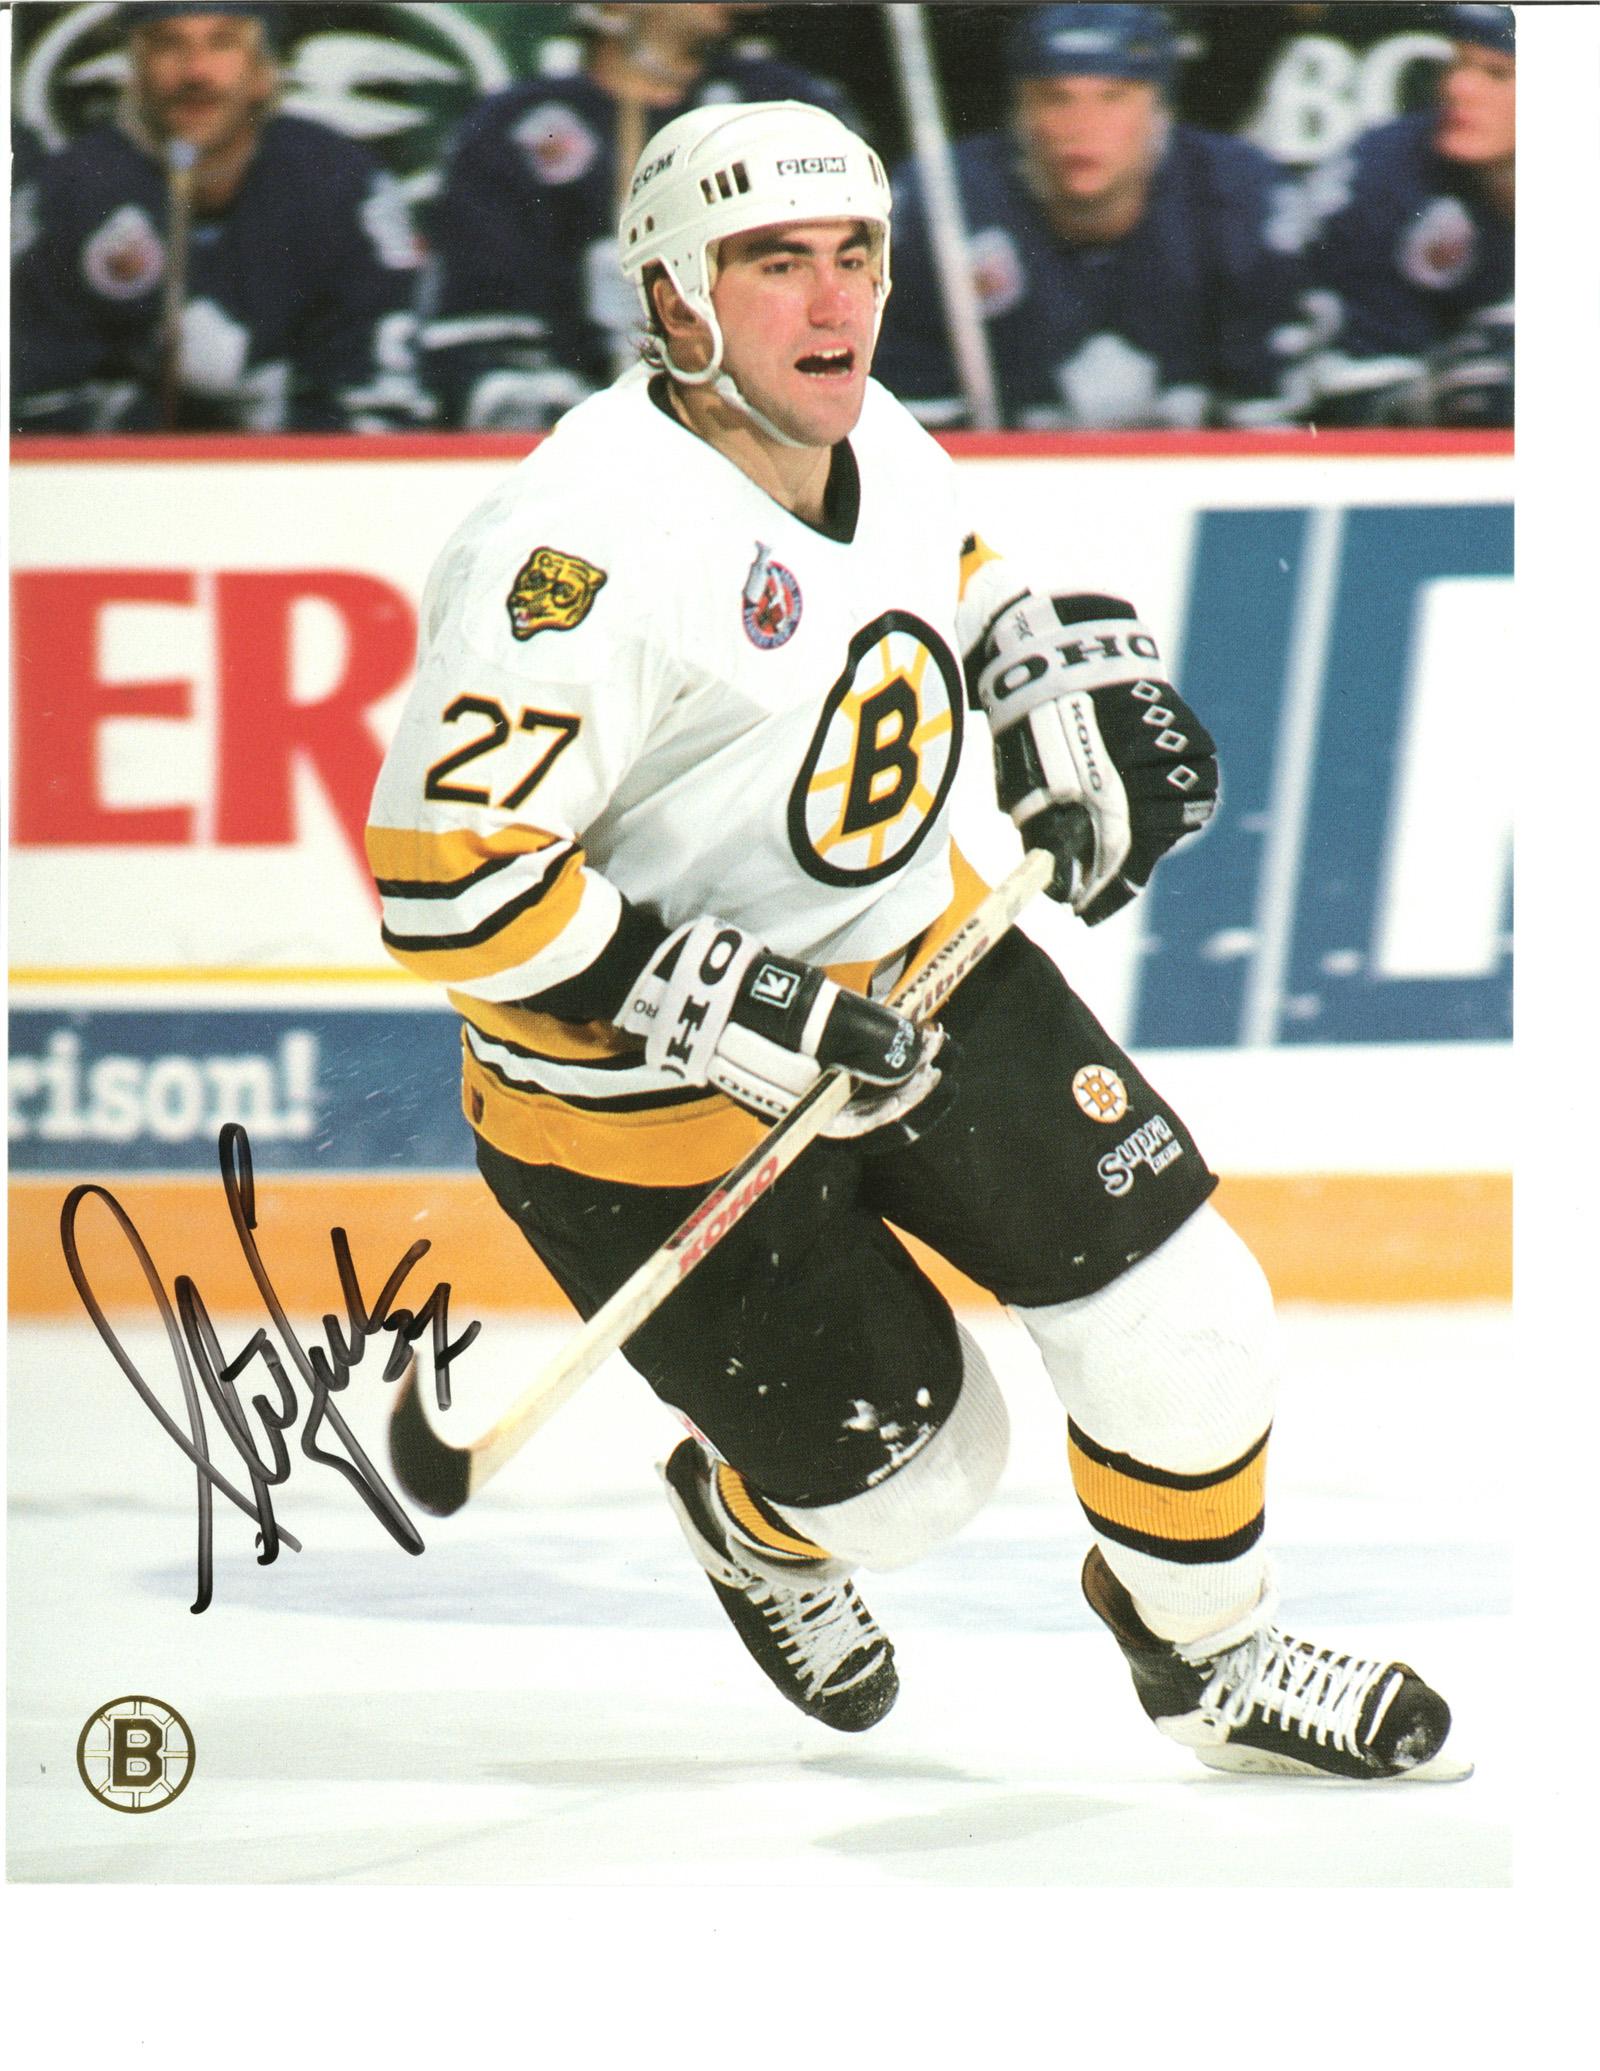 Steve Leach Autographed 8x10